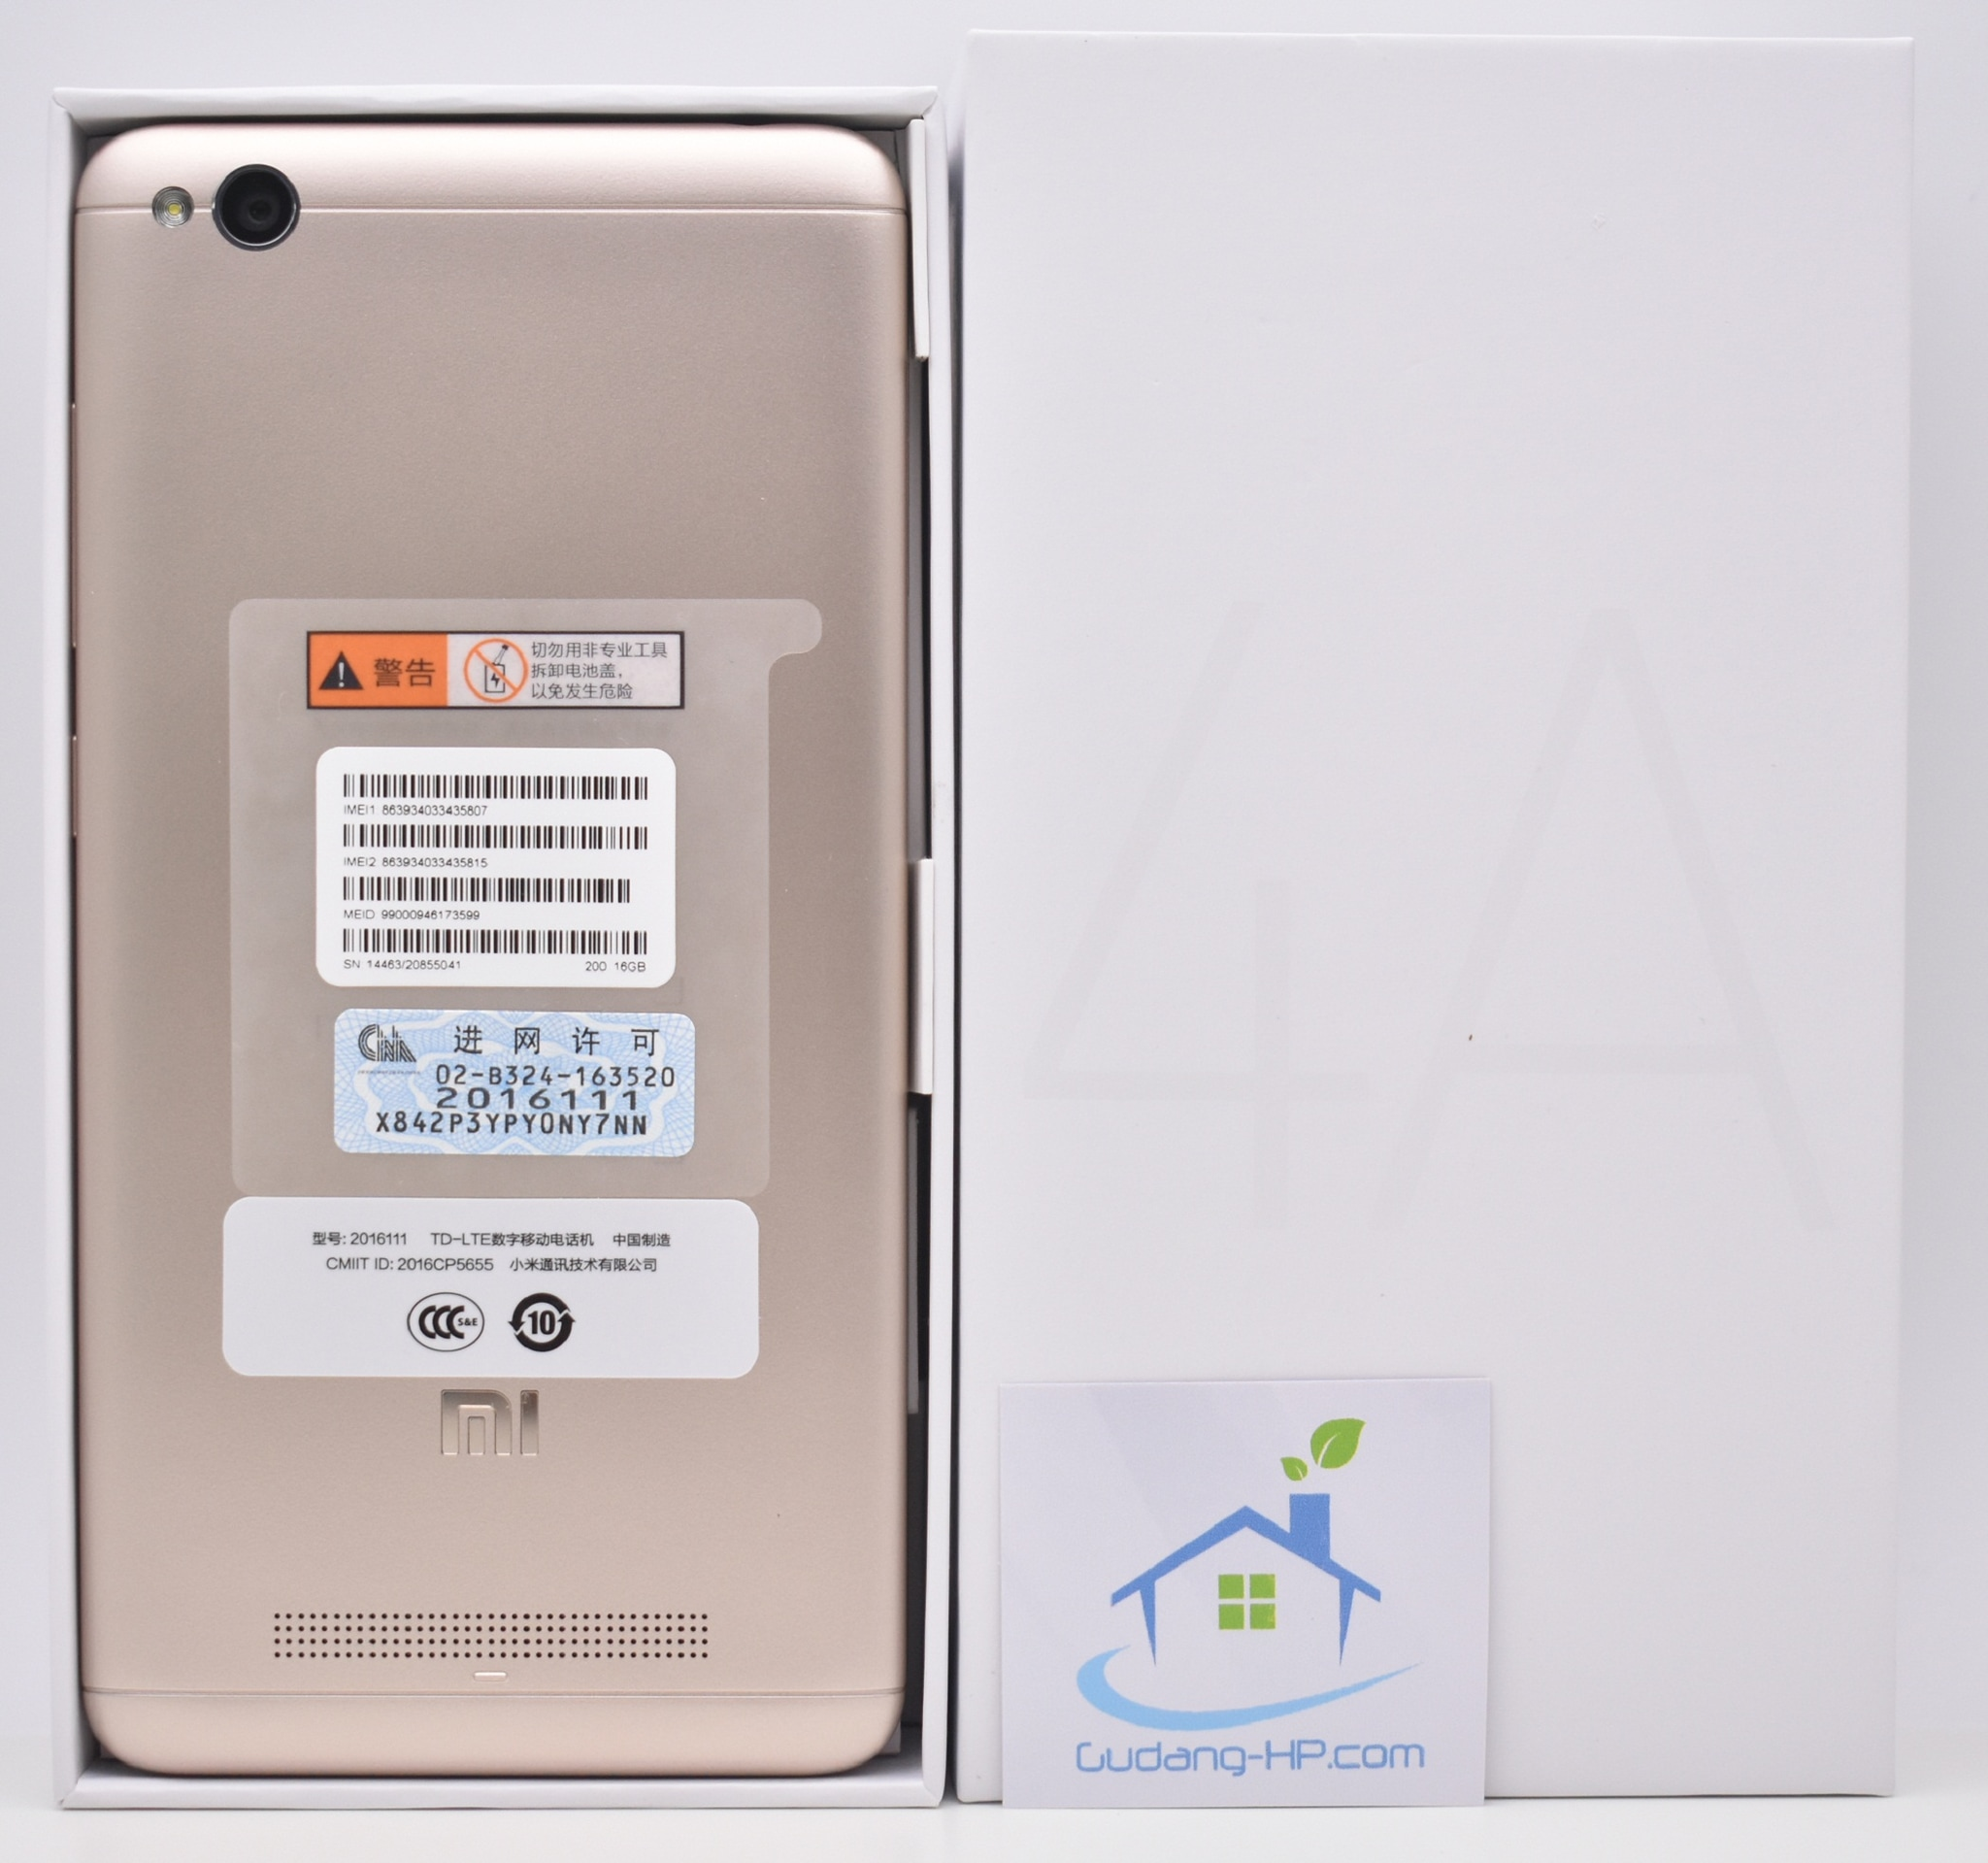 Jual Xiaomi Redmi 4a 2 16 Gb Garansi Distributor Gudang Hp 16gb Tokopedia